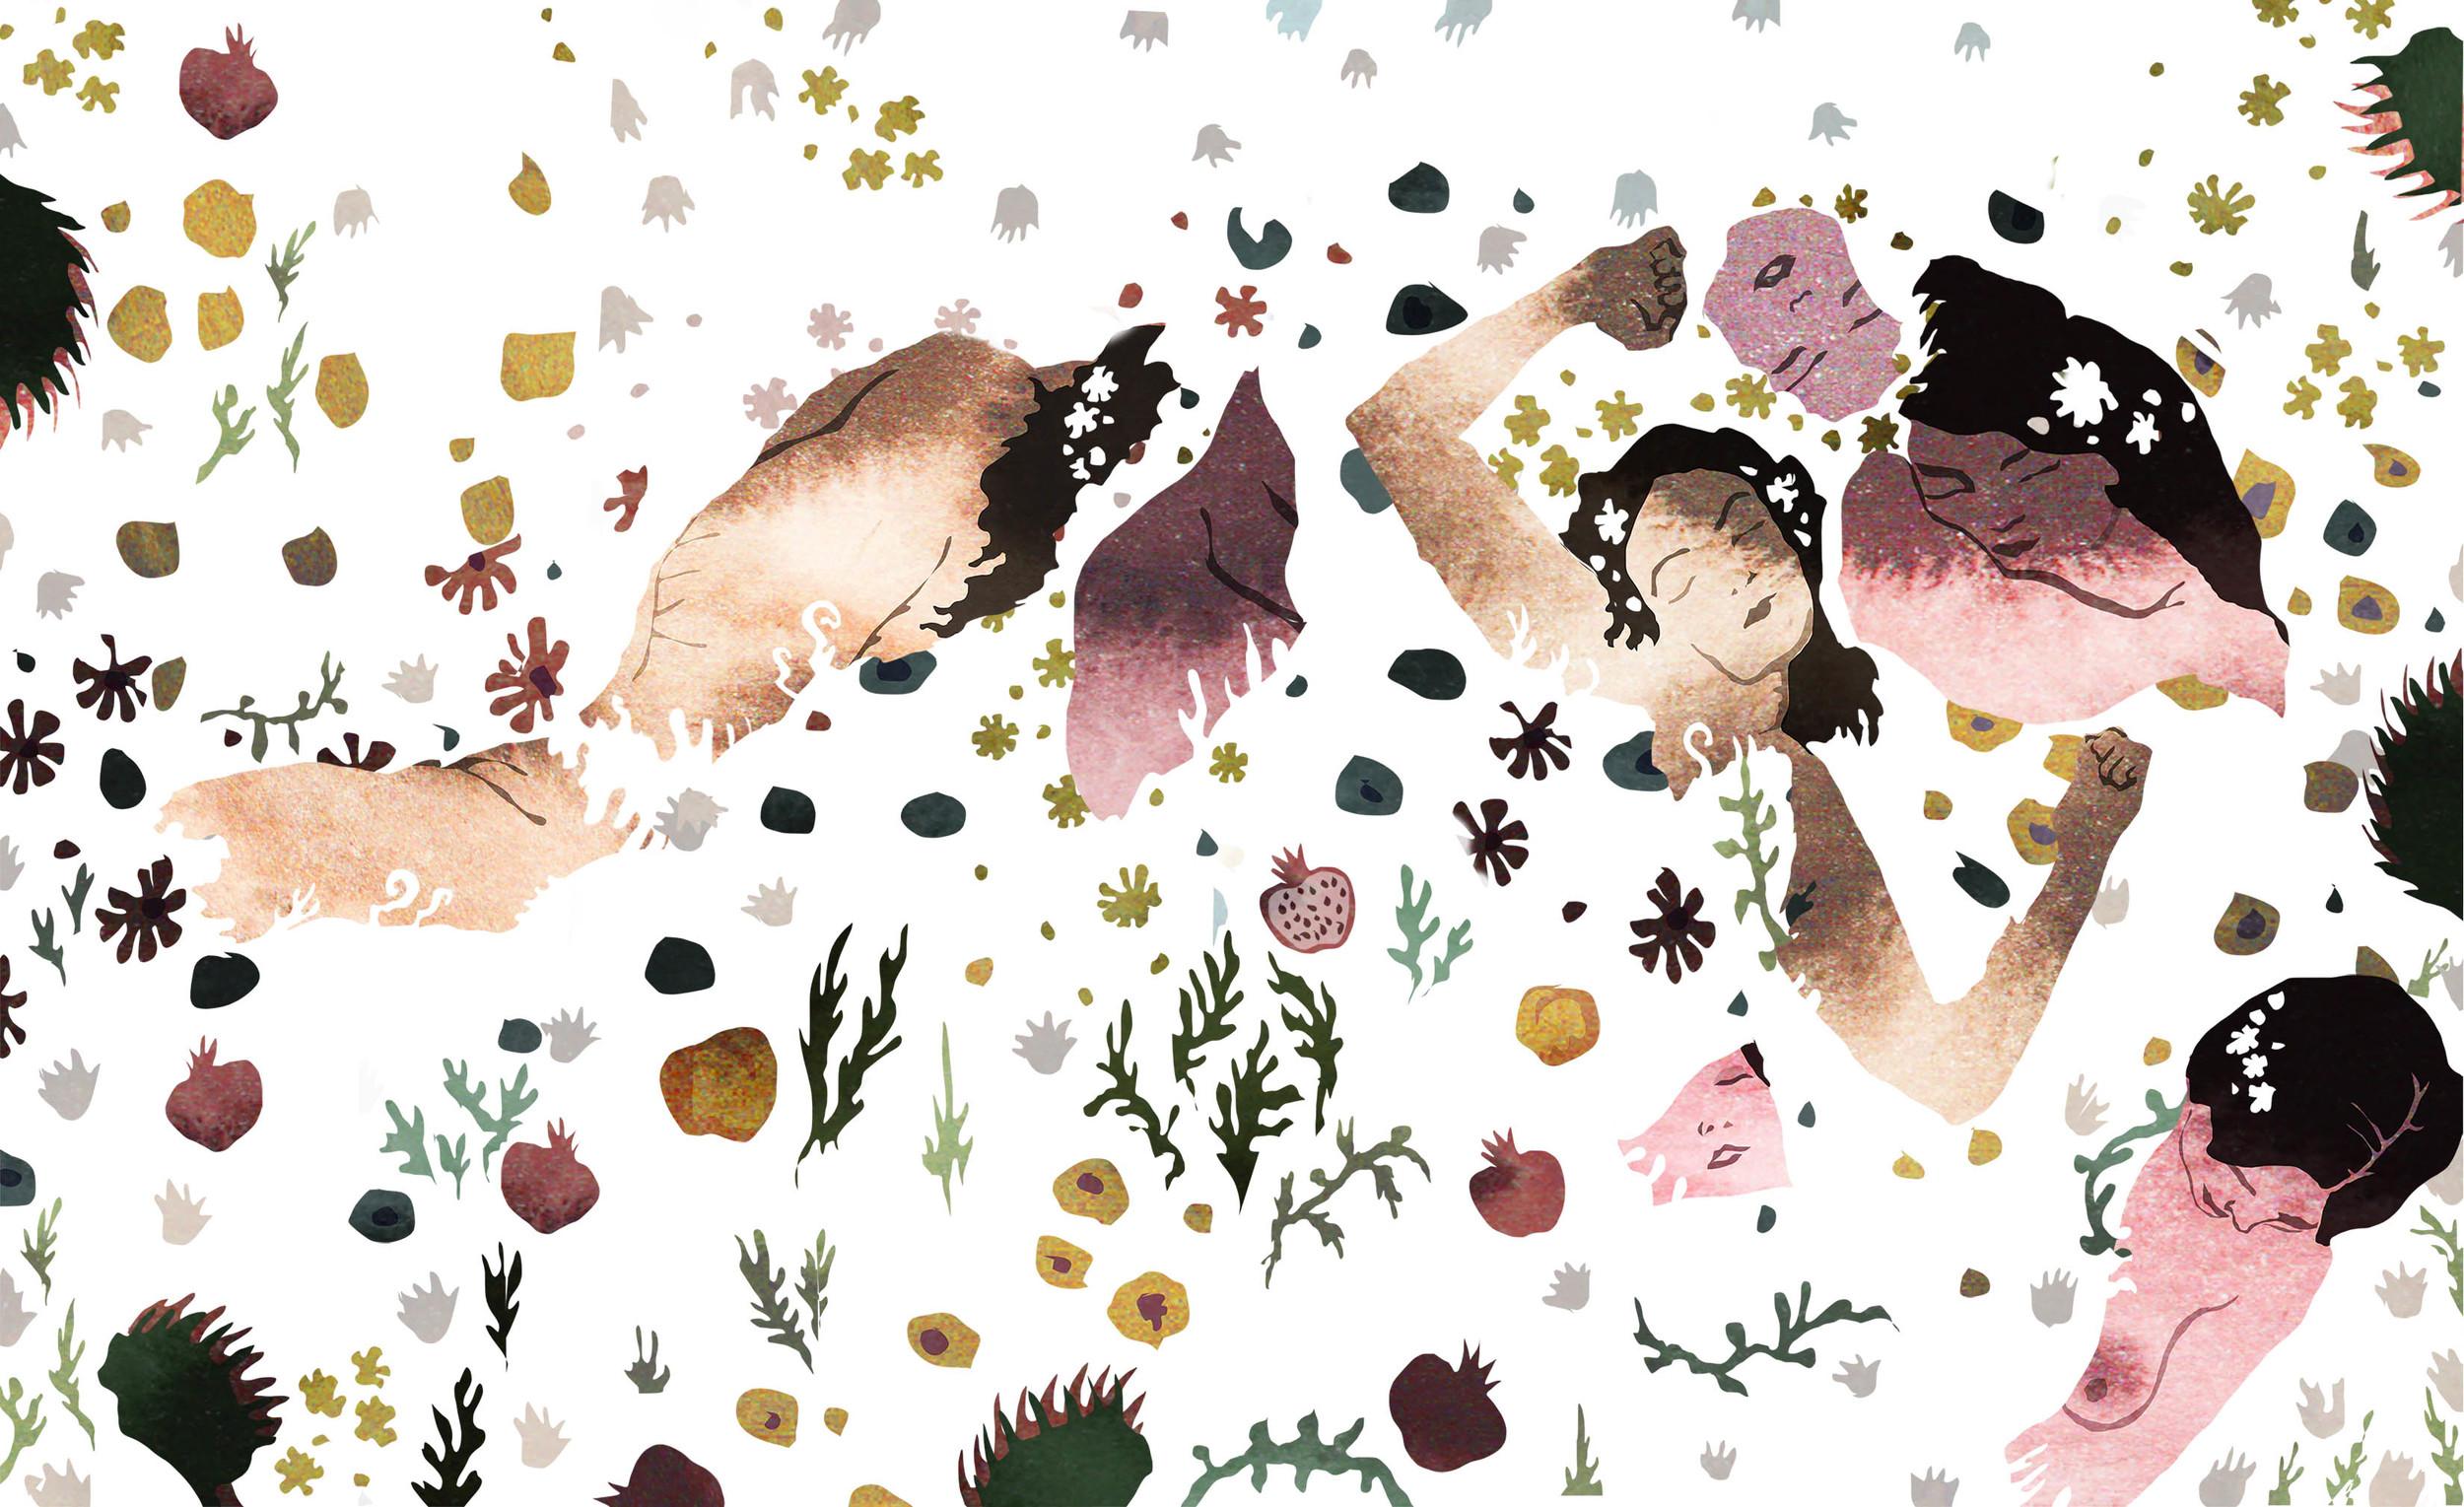 Forbidden Fruit (After Klimt), digital with traditional ink textures, 2015